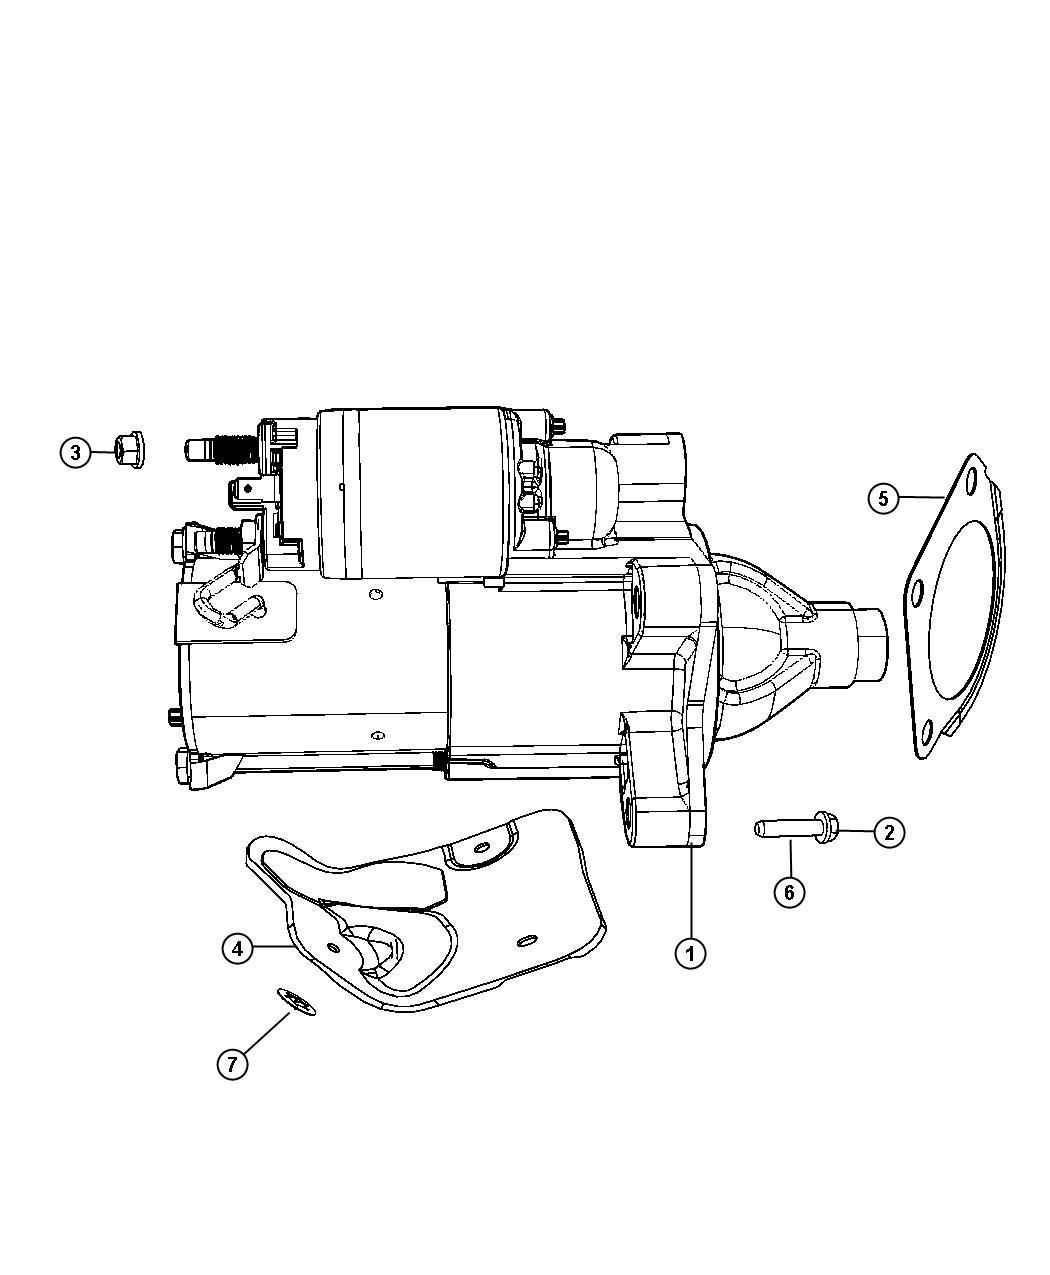 Jeep Wrangler Starter Remanufactured Engine